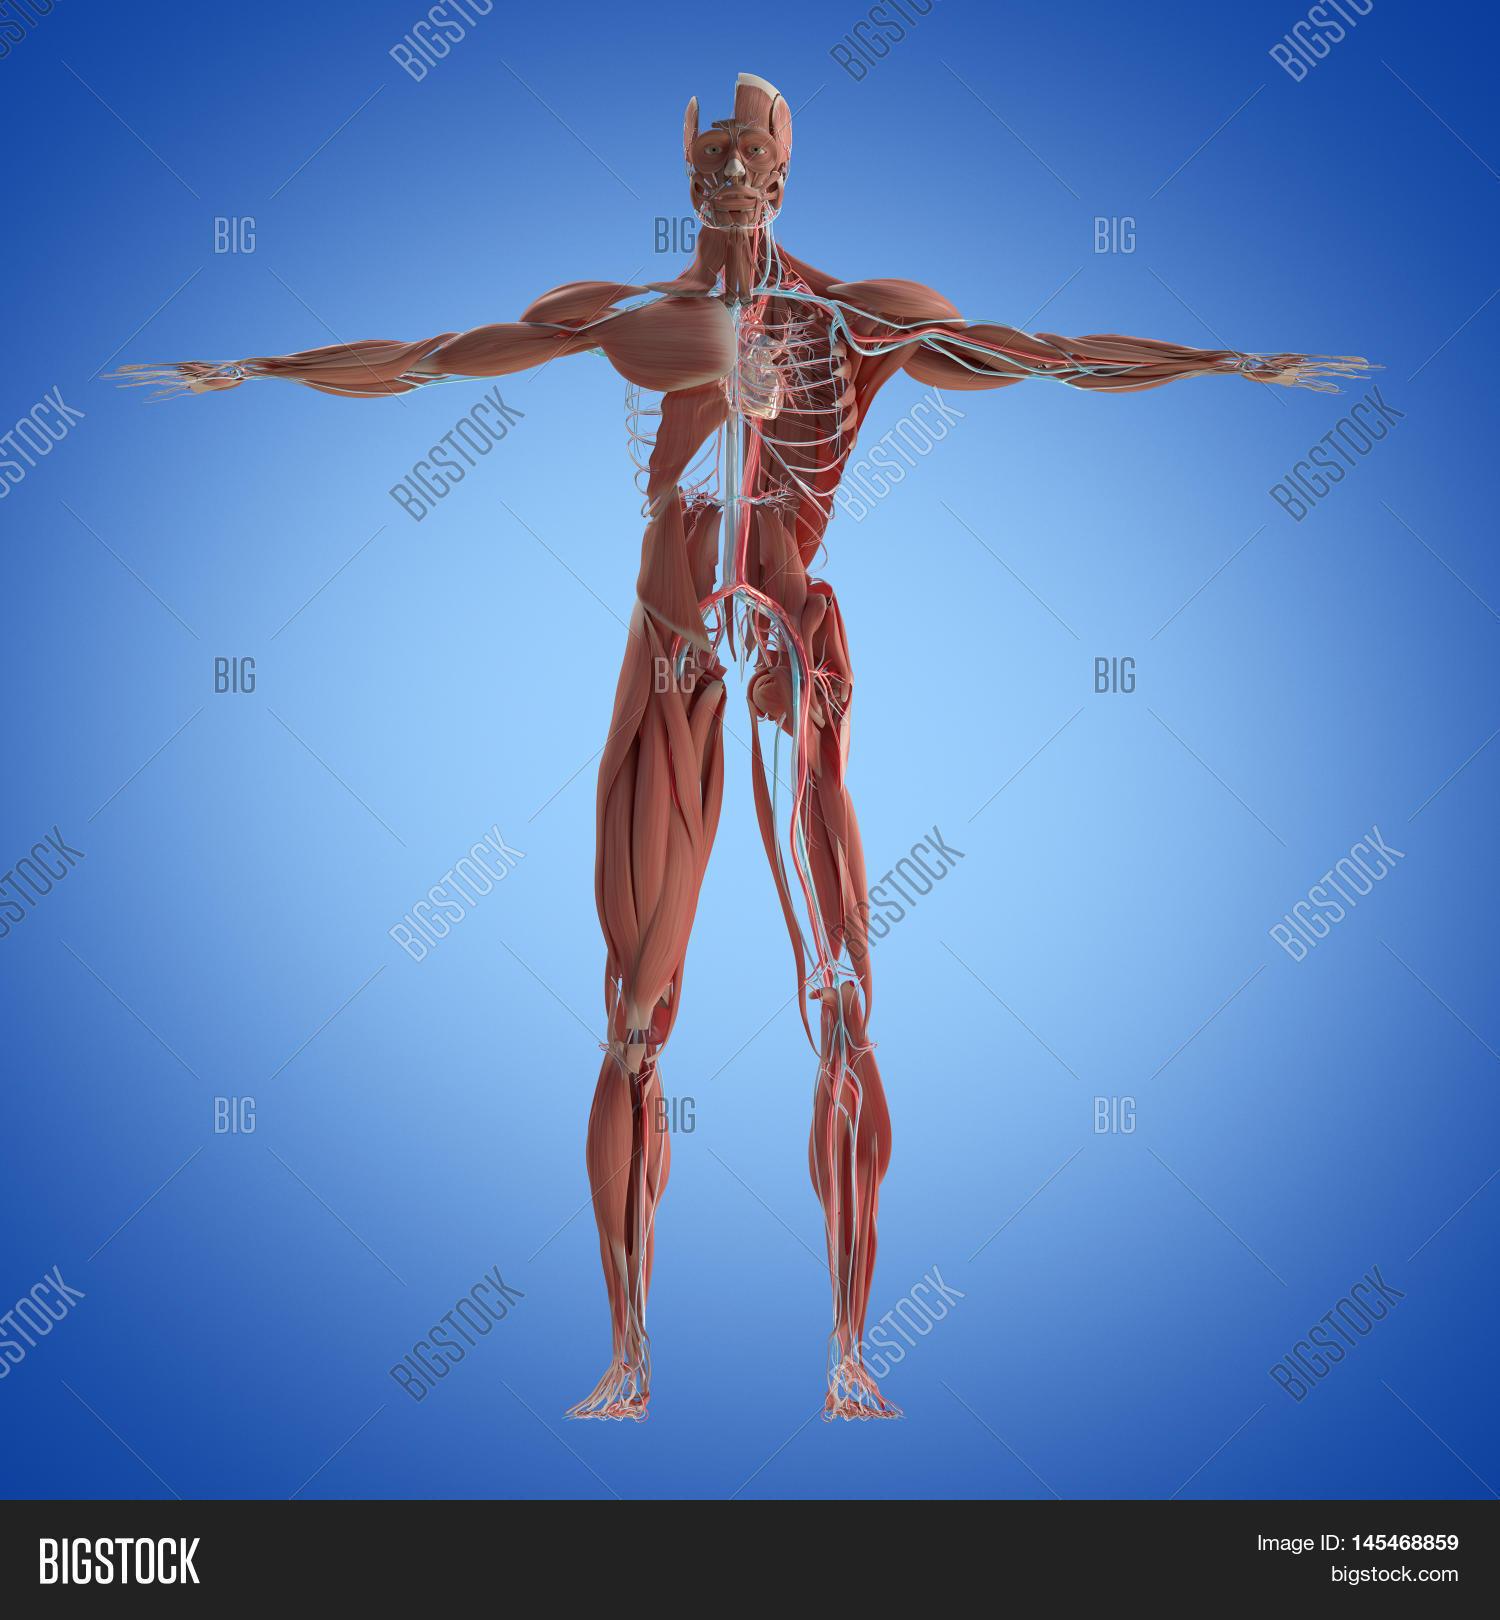 Human Anatomy Full Image Photo Free Trial Bigstock